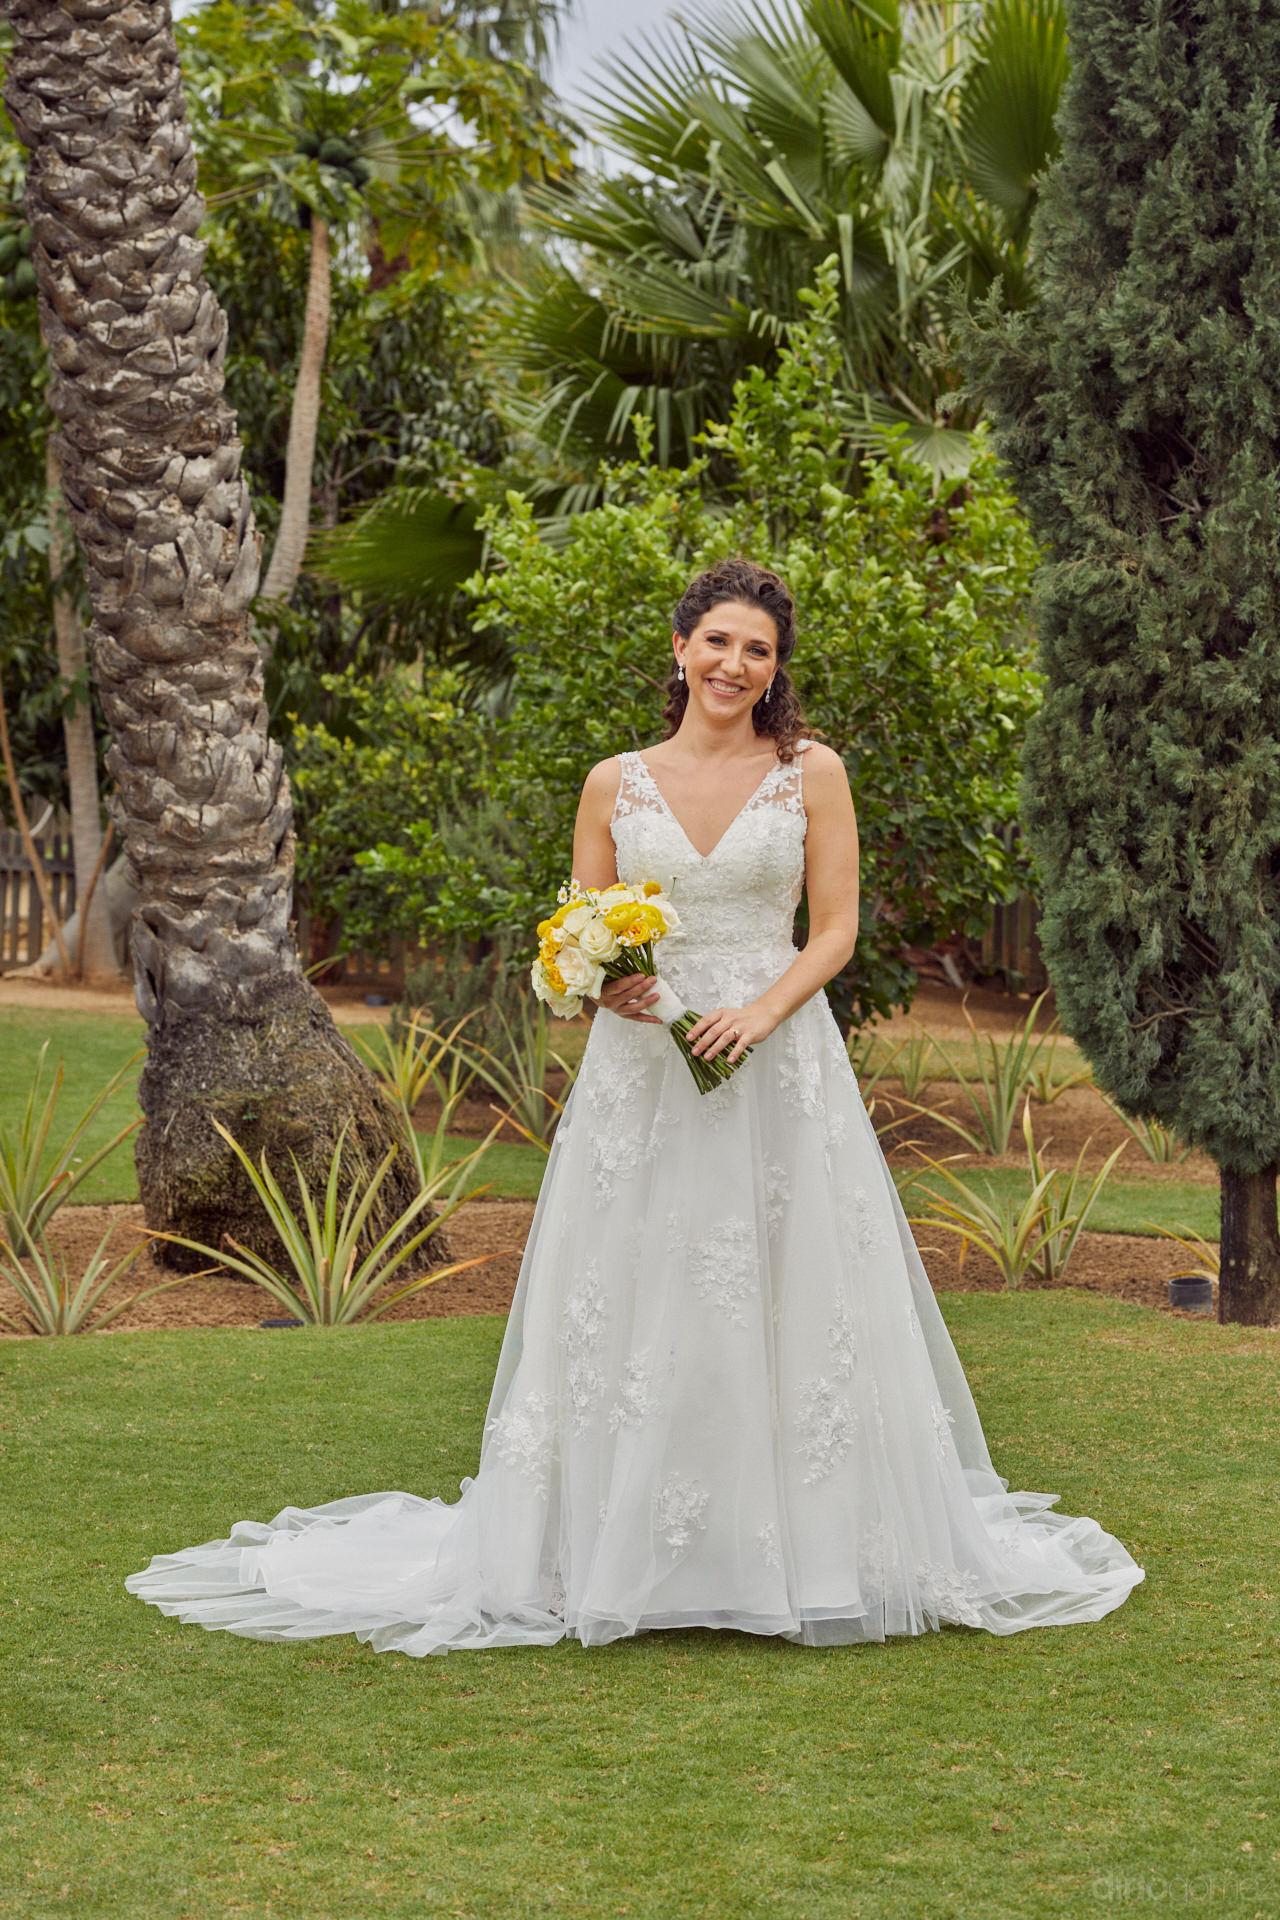 Stunning Wedding Photographs In Cabo San Lucas - Hilary & Bryan Flora Wedding